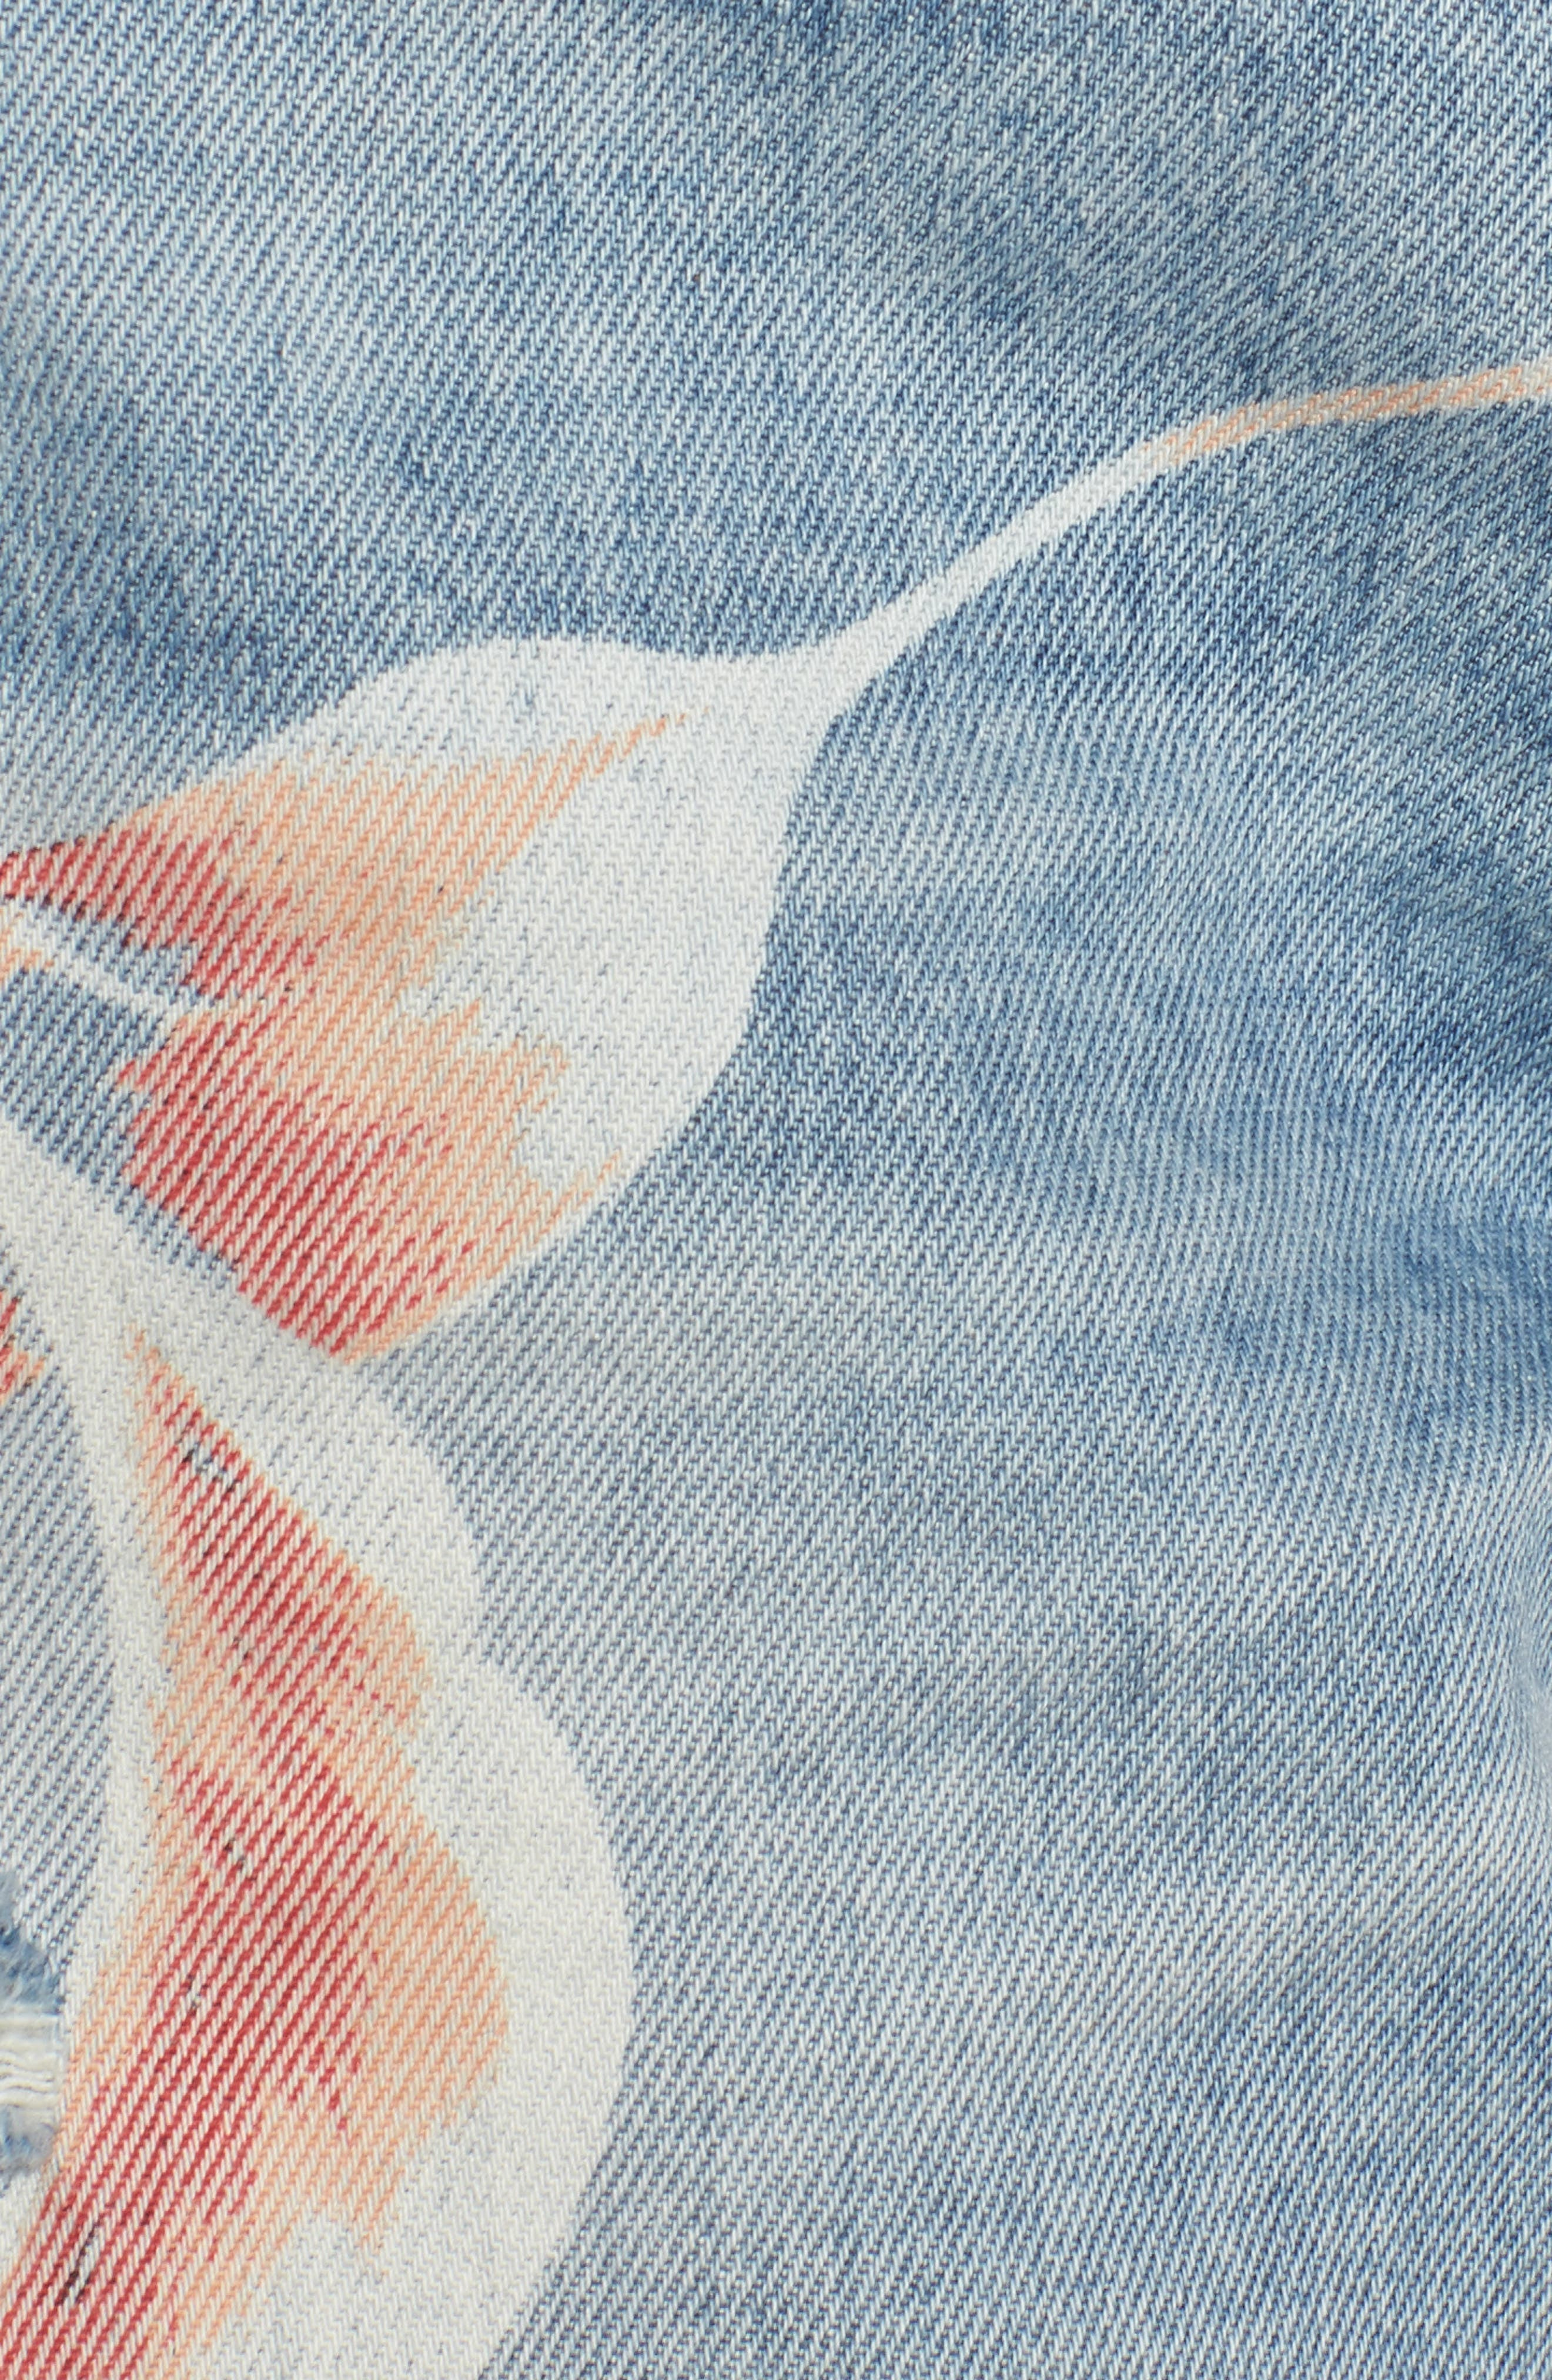 Valeri Painted Denim Shorts,                             Alternate thumbnail 6, color,                             001